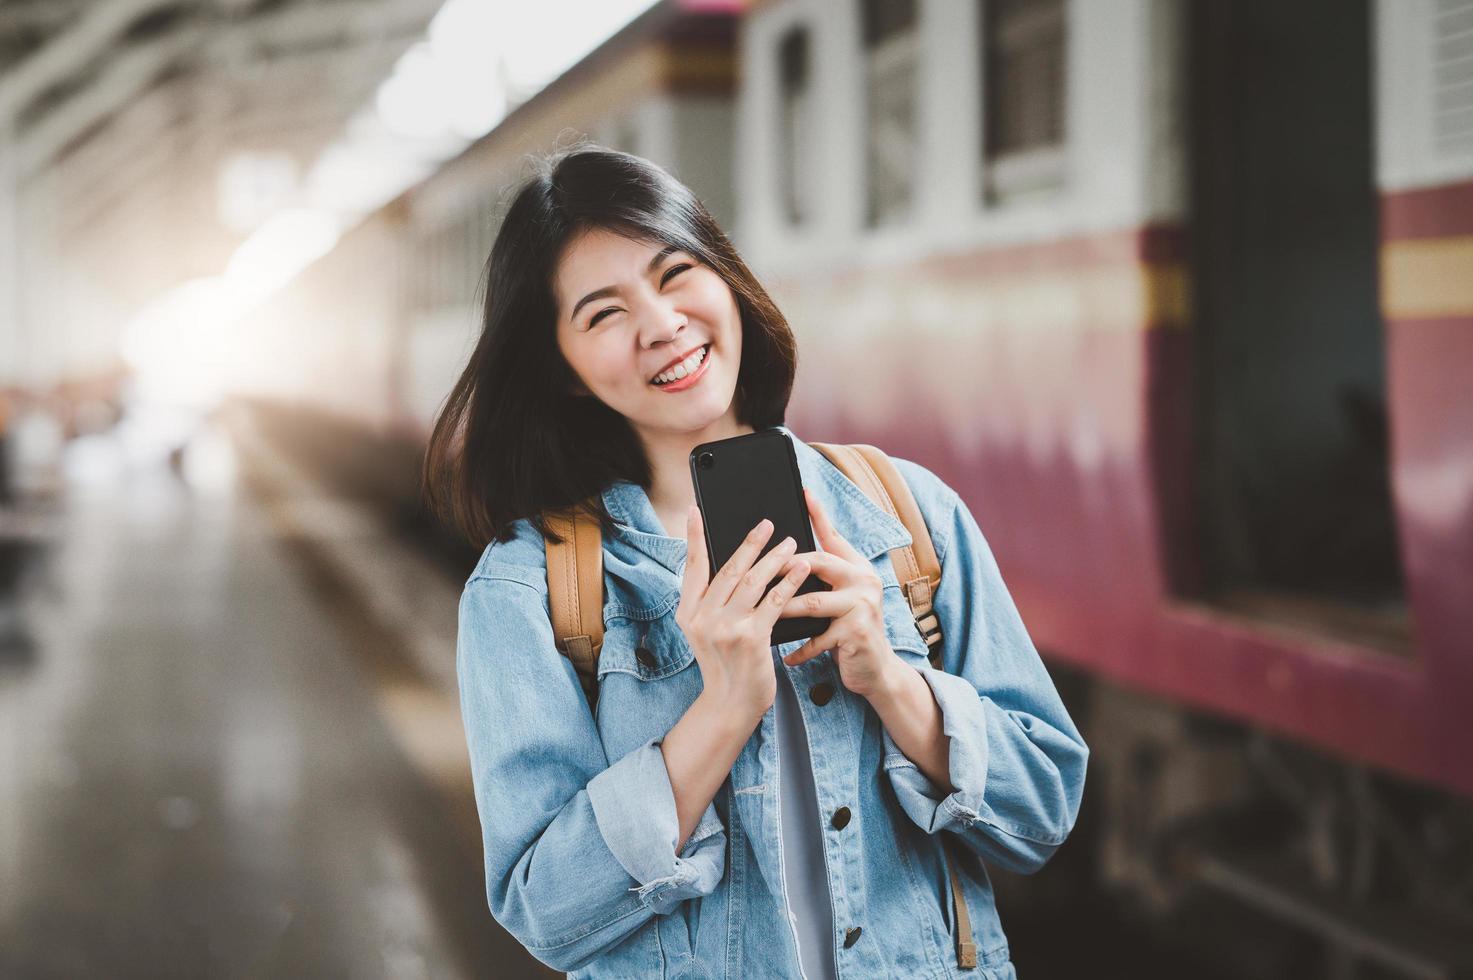 Happy Asian woman at train station 1229298 Stock Photo at Vecteezy